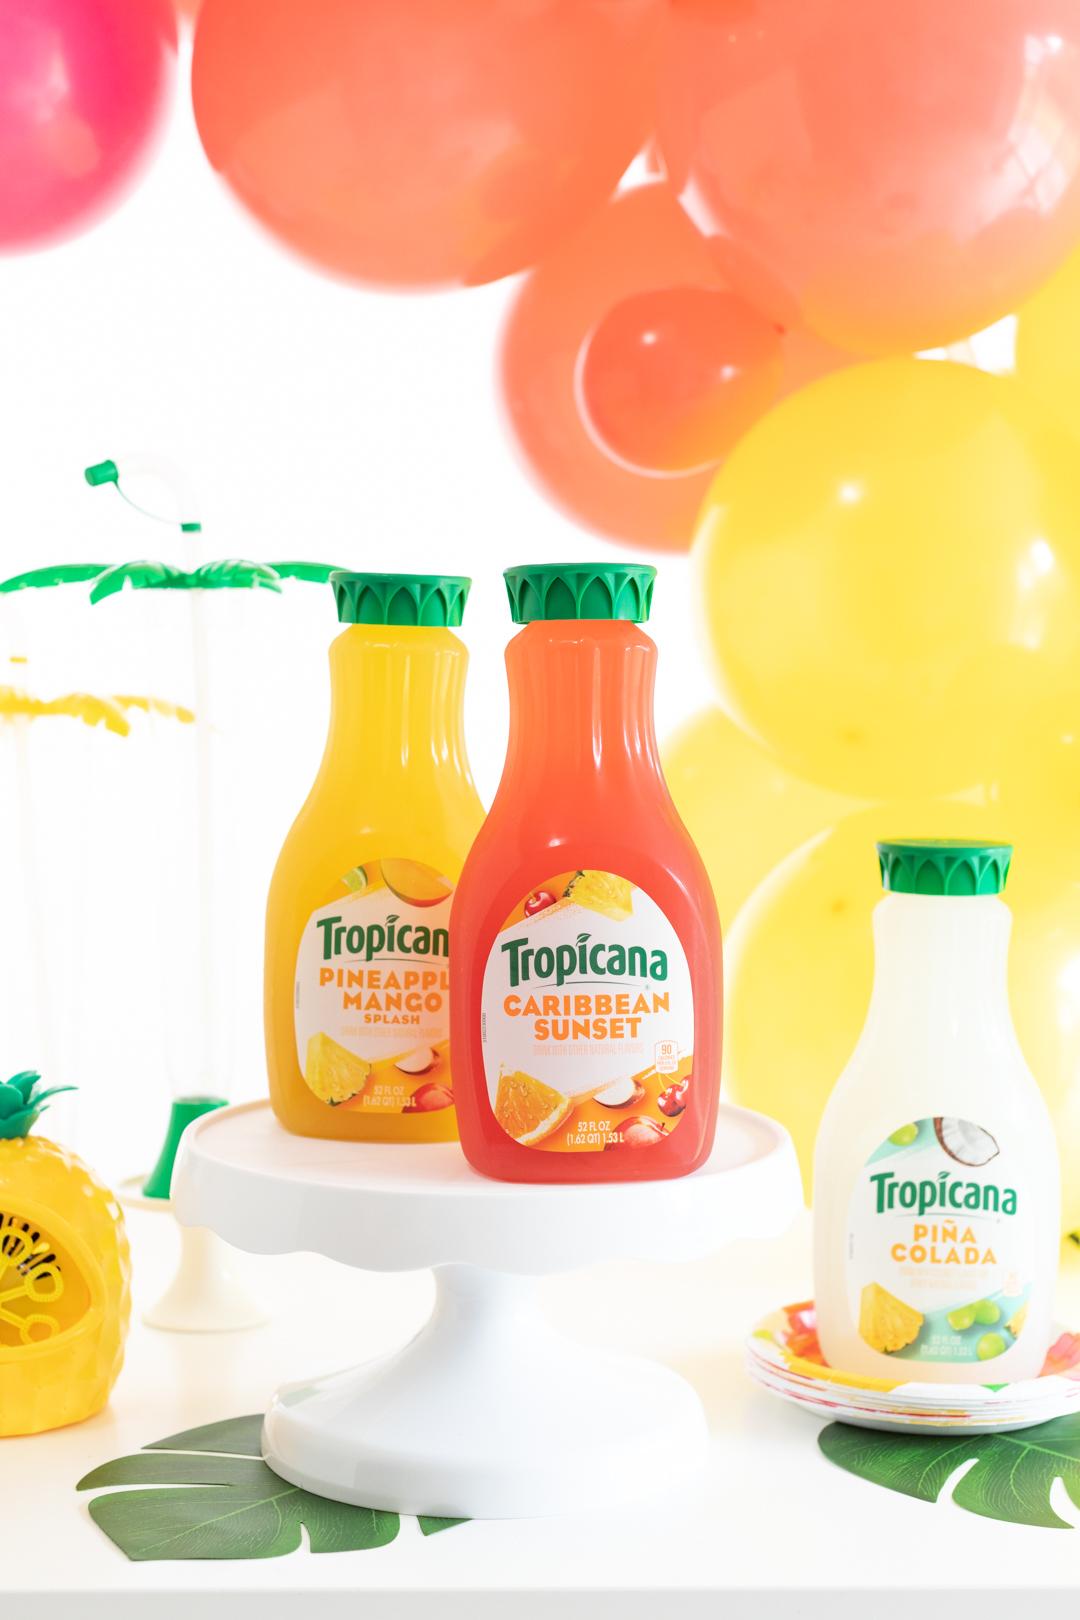 fun tropicana flavors. Tropicana® Caribbean Sunset Tropicana® Pina Colada Tropicana® Pineapple Mango Splash